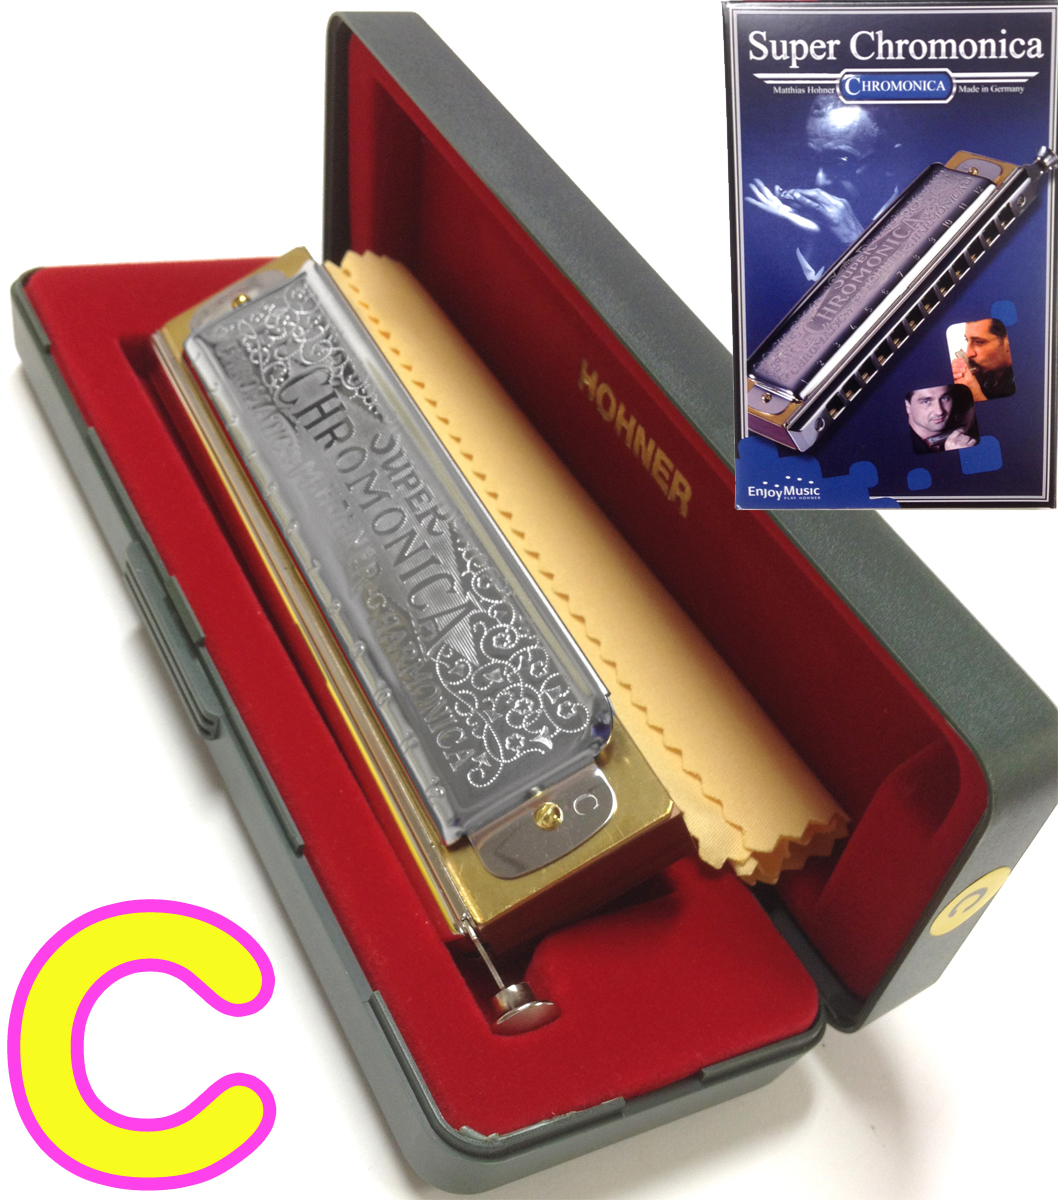 HOHNER ( ホーナー ) 【 C調 】 Super Chromonica 270 クロマチックハーモニカ 270/48 スーパークロモニカ270 12穴 3オクターブ スライド式 ハーモニカ クロモニカ270 送料無料